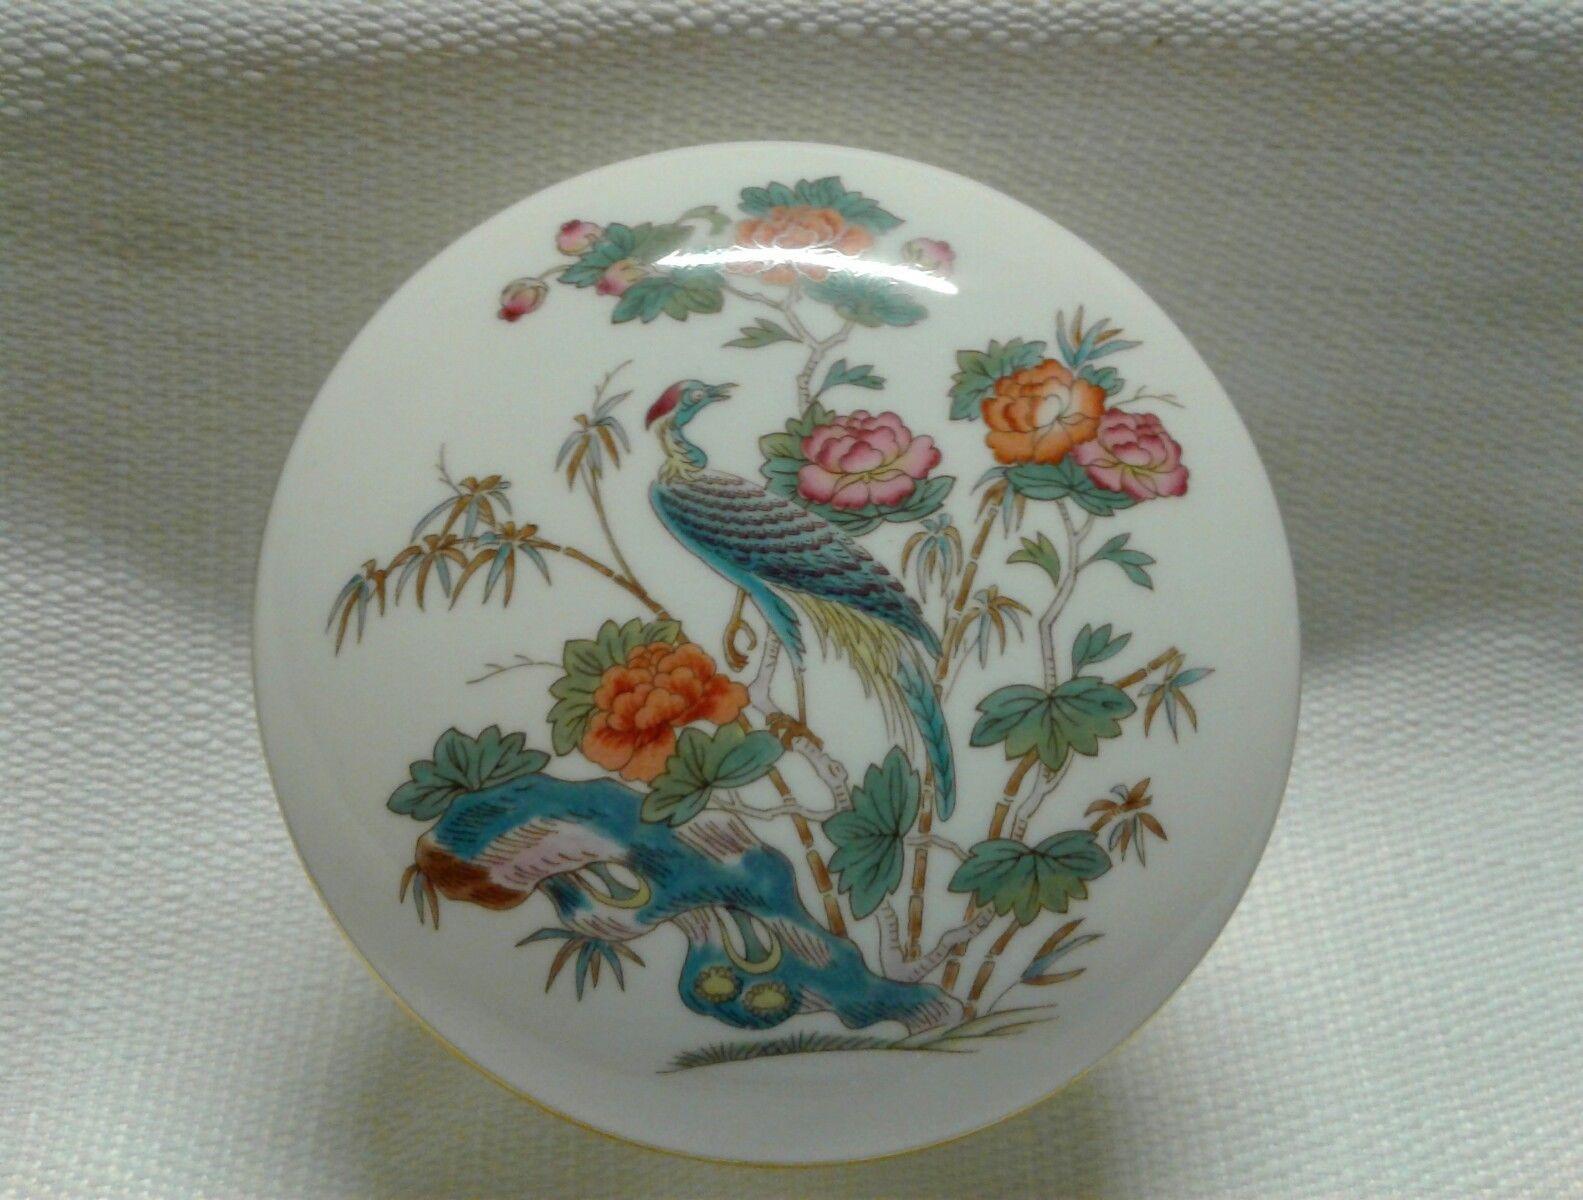 wedgwood kutani crane bud vase of wedgwood bone china asian peacock trinket box gold trim 3 7 8 in 1 of 4free shipping